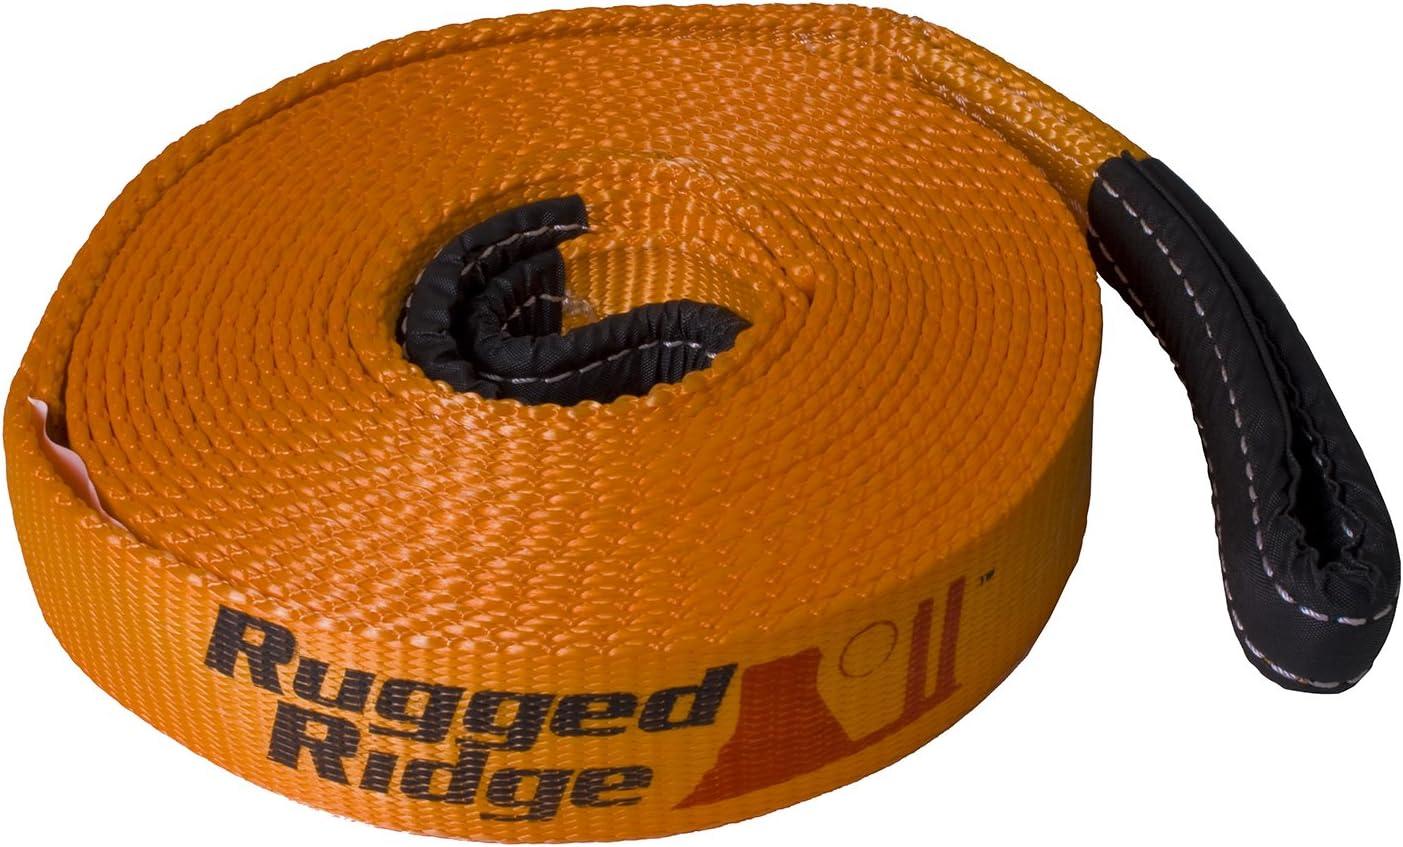 Rugged Ridge 15104.04 1 x 15 10,000lb Recovery Strap